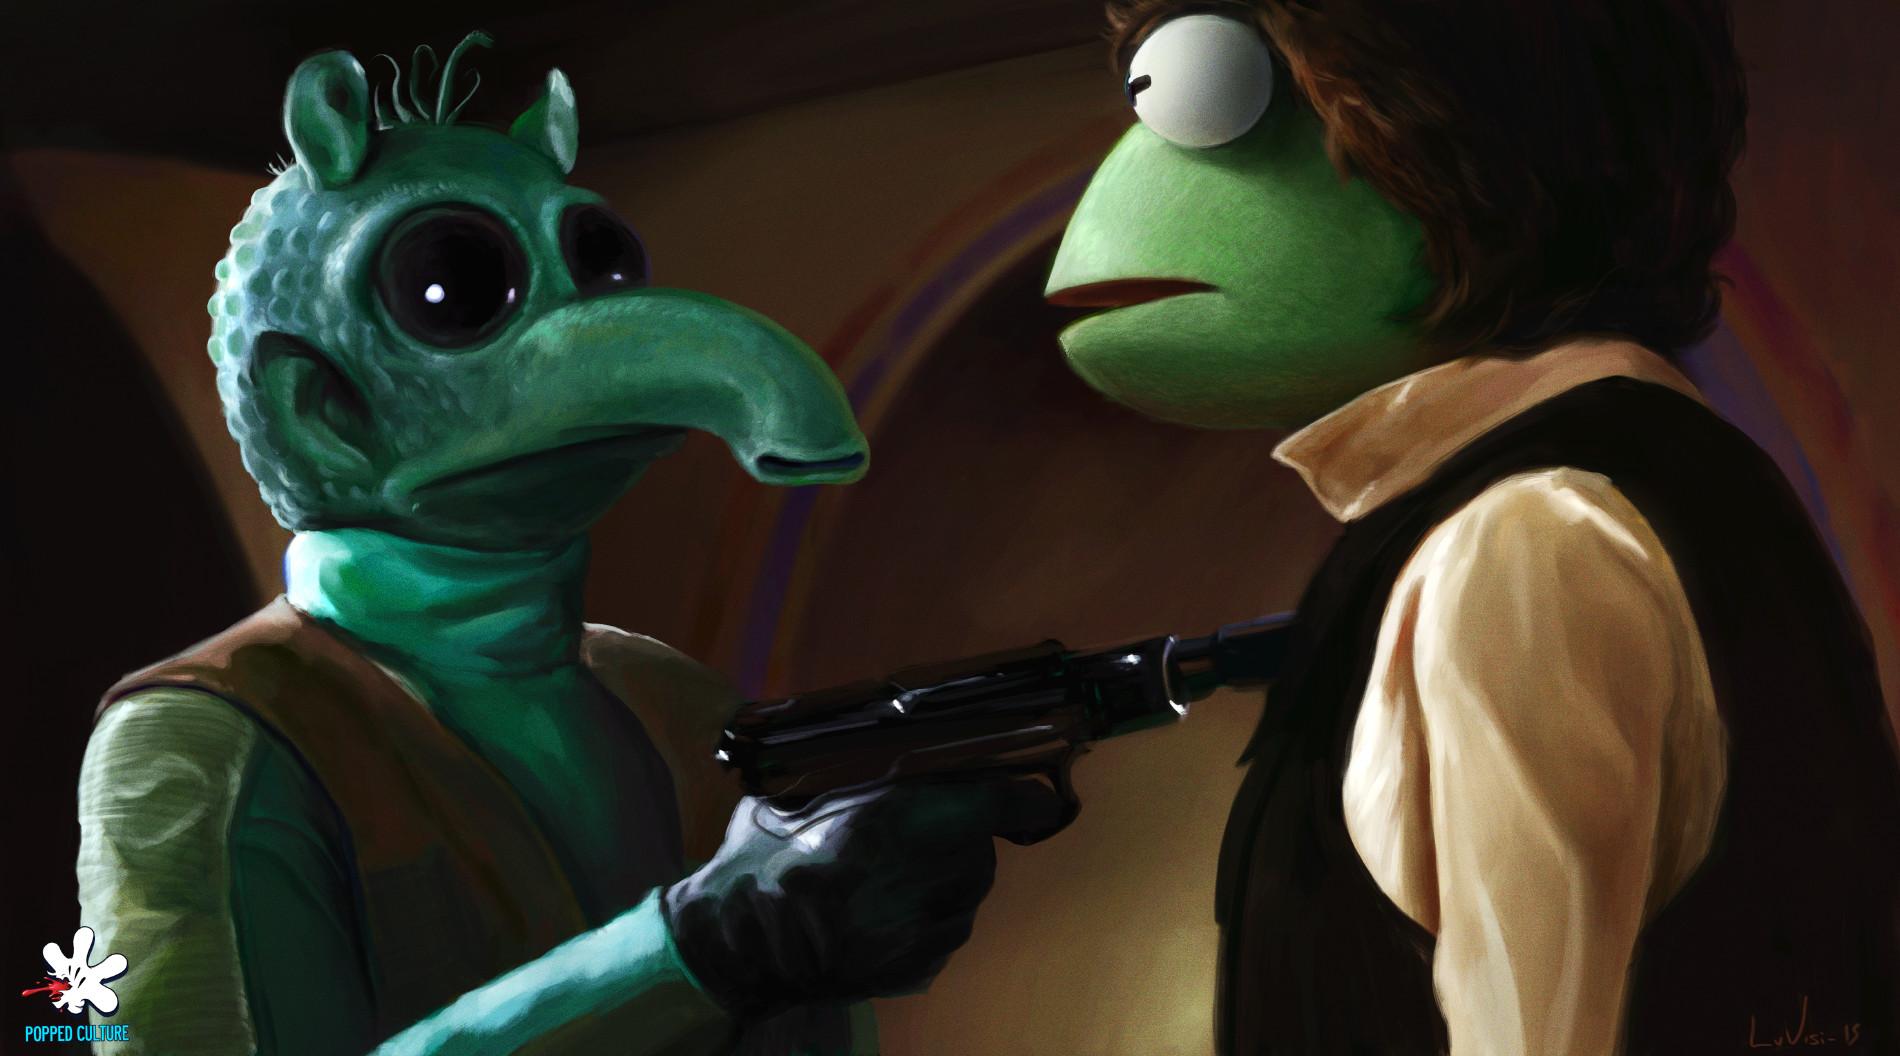 Star Wars Parody The Muppets ArtStation Dan Luvisi Blaster Artwork Science Fiction Greedo Star Wars  1900x1056